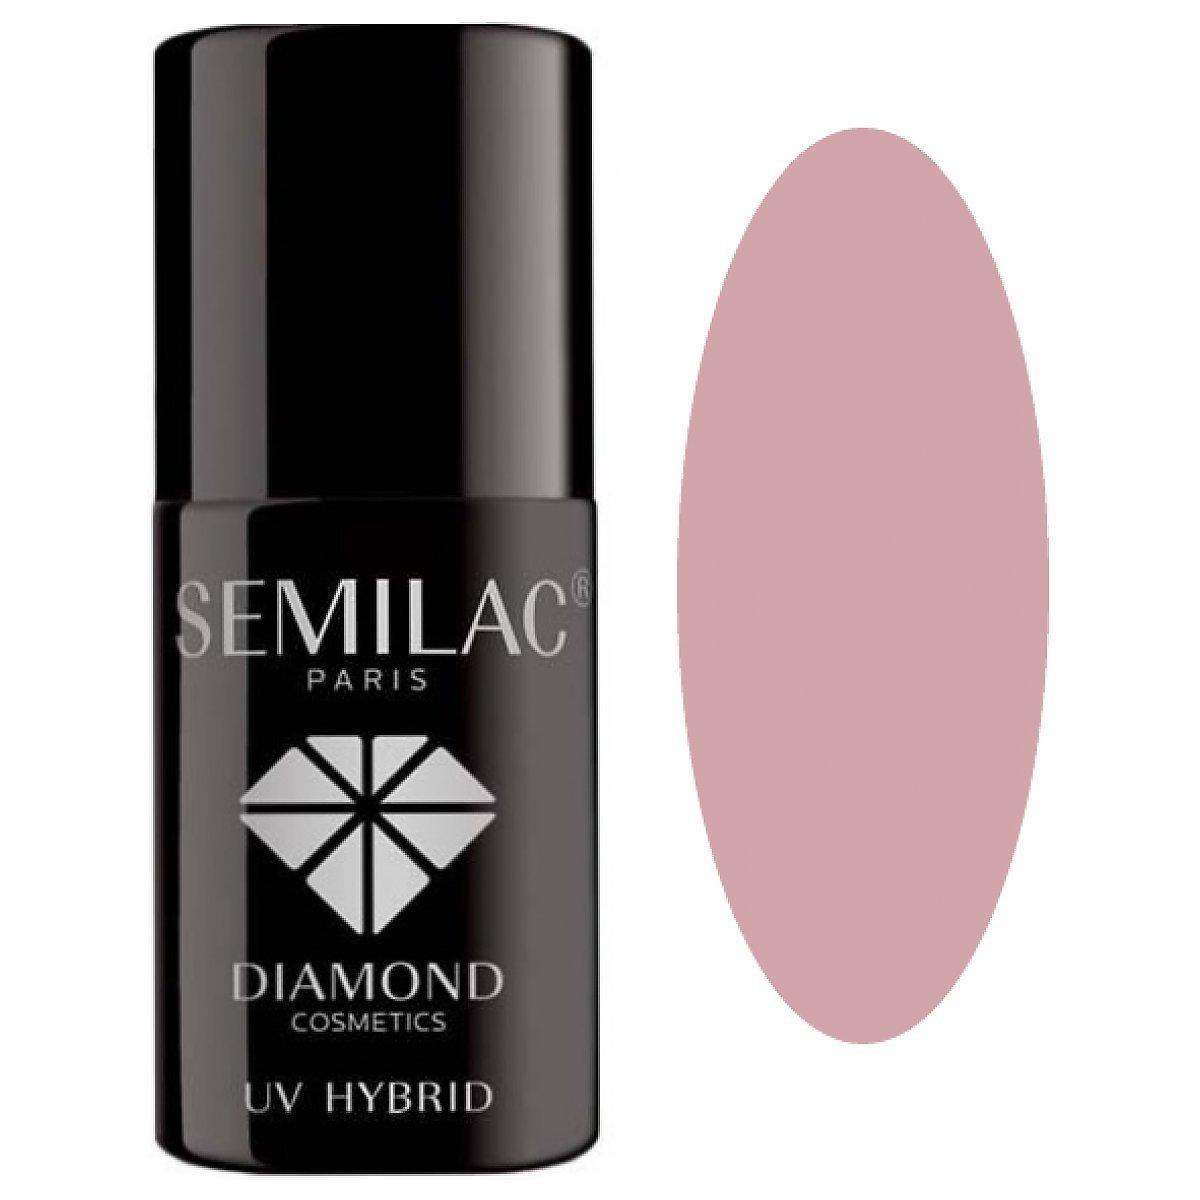 057 UV Hybrid Semilac Nude Beige Rose 7ml